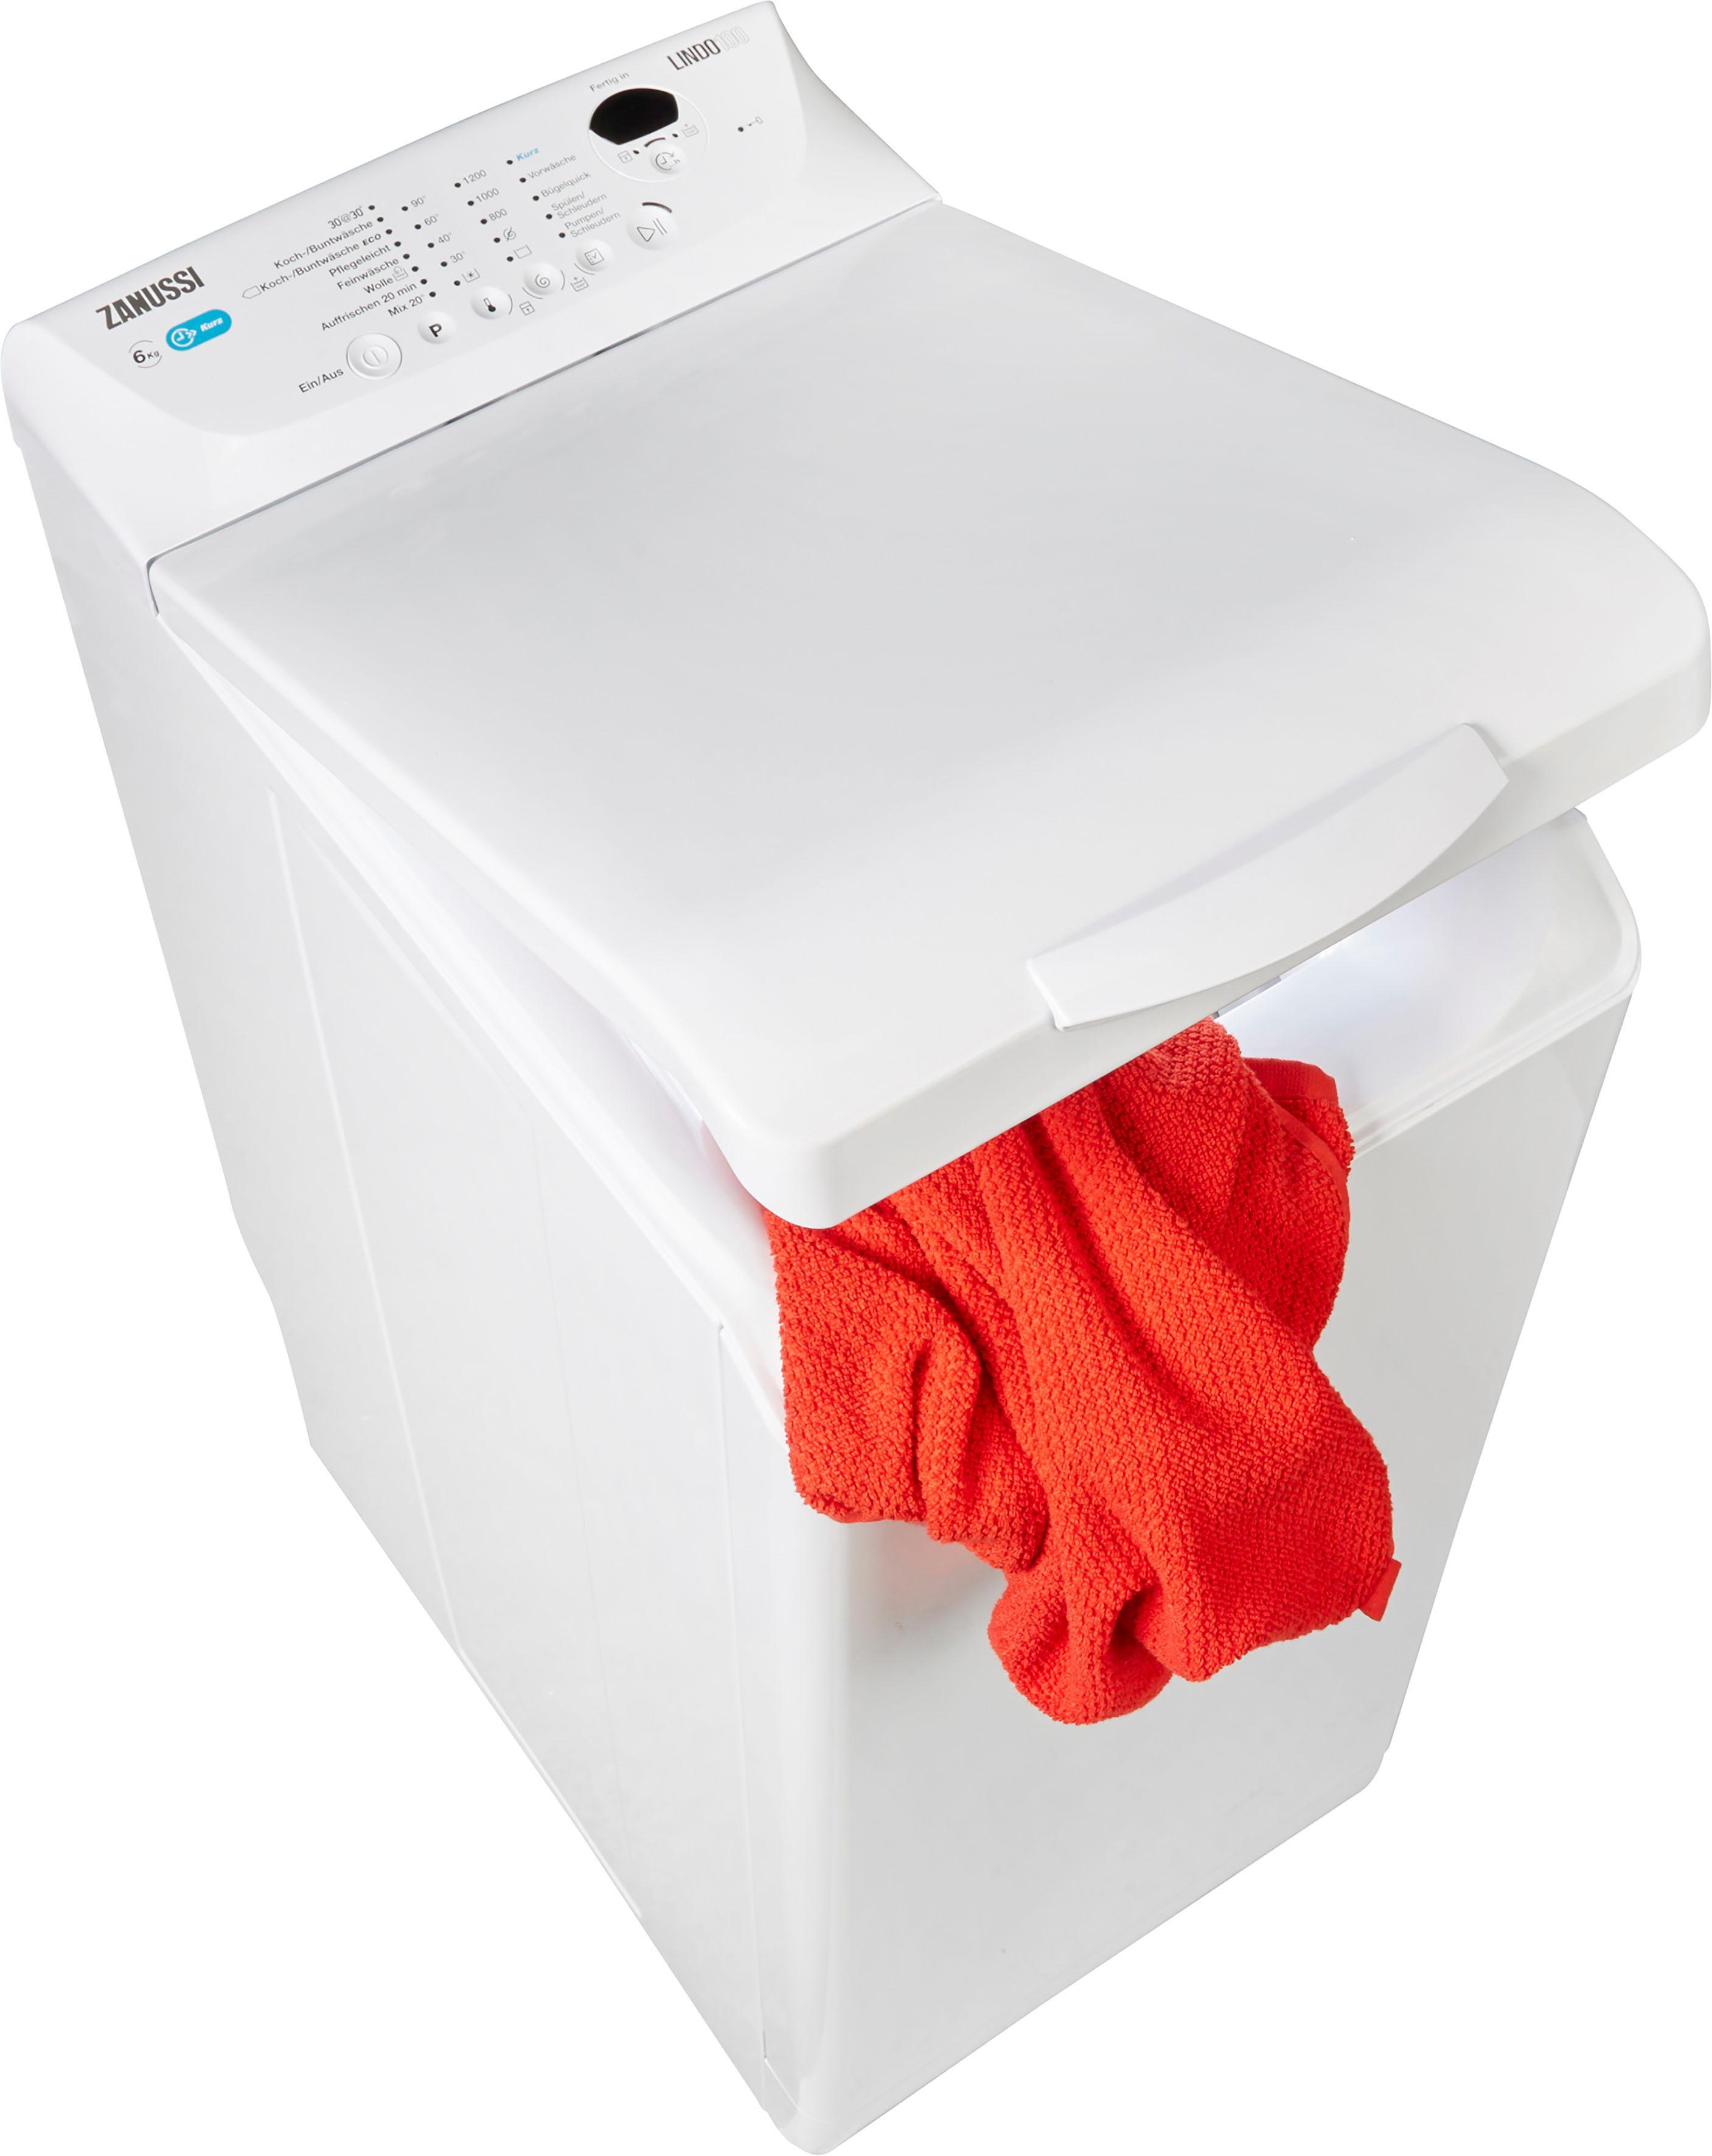 Zanussi Waschmaschine Toplader ZWQ61235CI | Bad > Waschmaschinen und Trockner > Toplader | Weiß | Zanussi